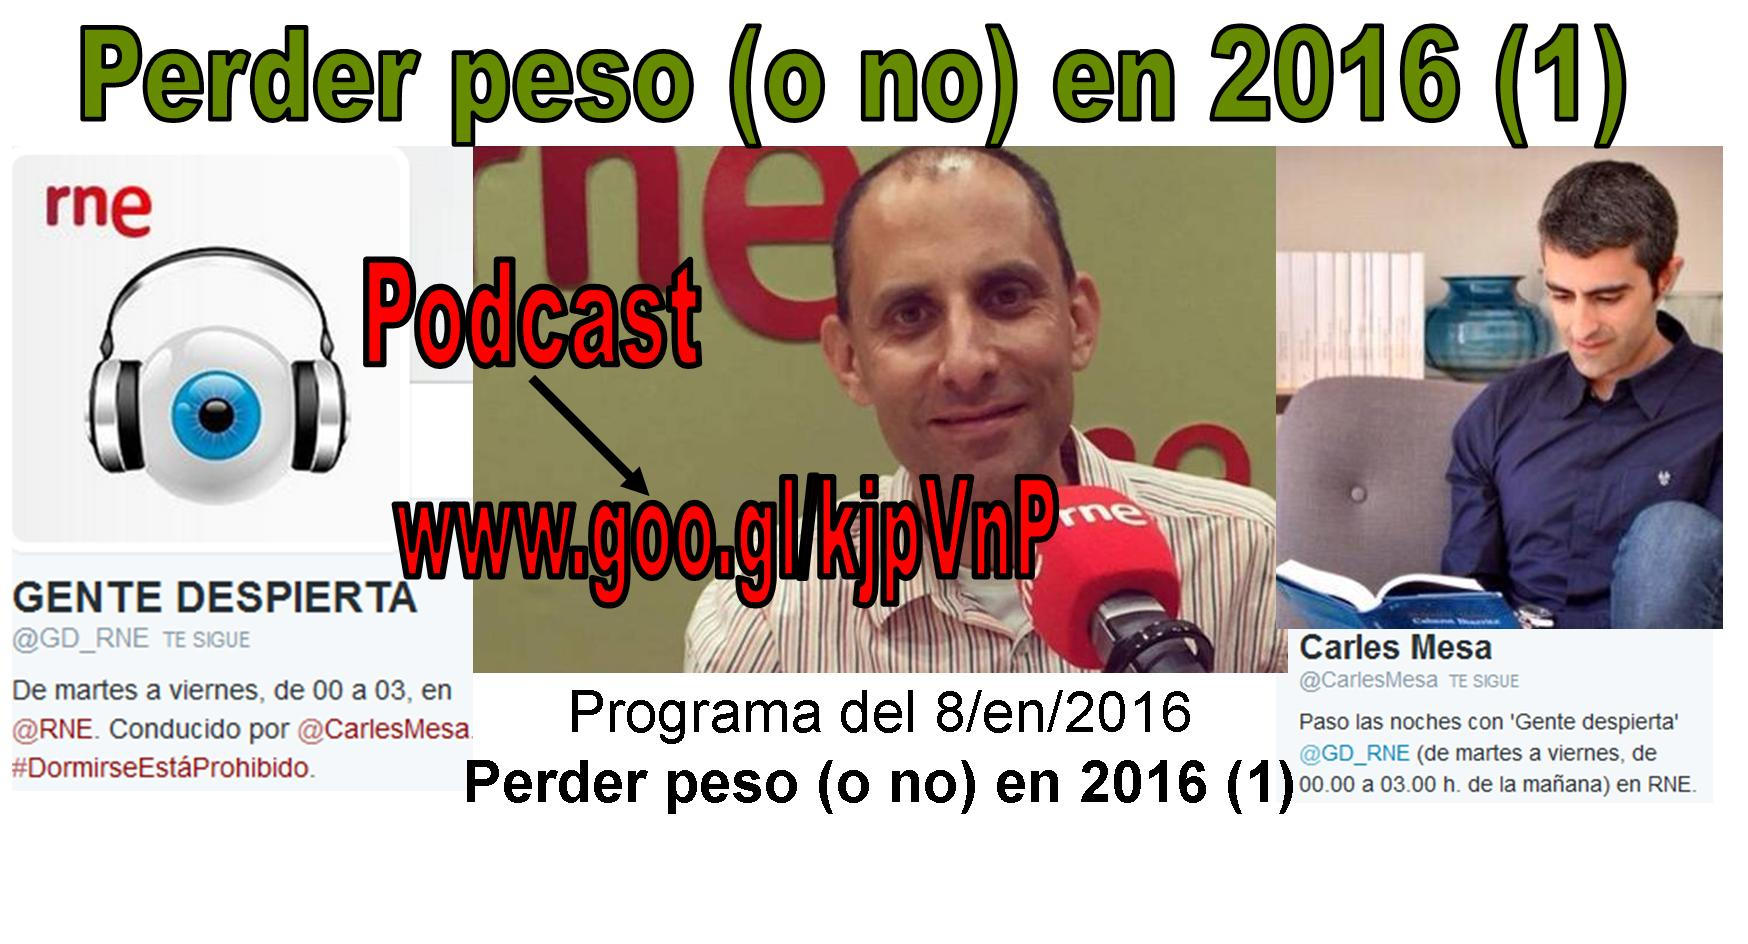 Adelg zame mi nteme archivos julio basulto for Carles mesa radio nacional